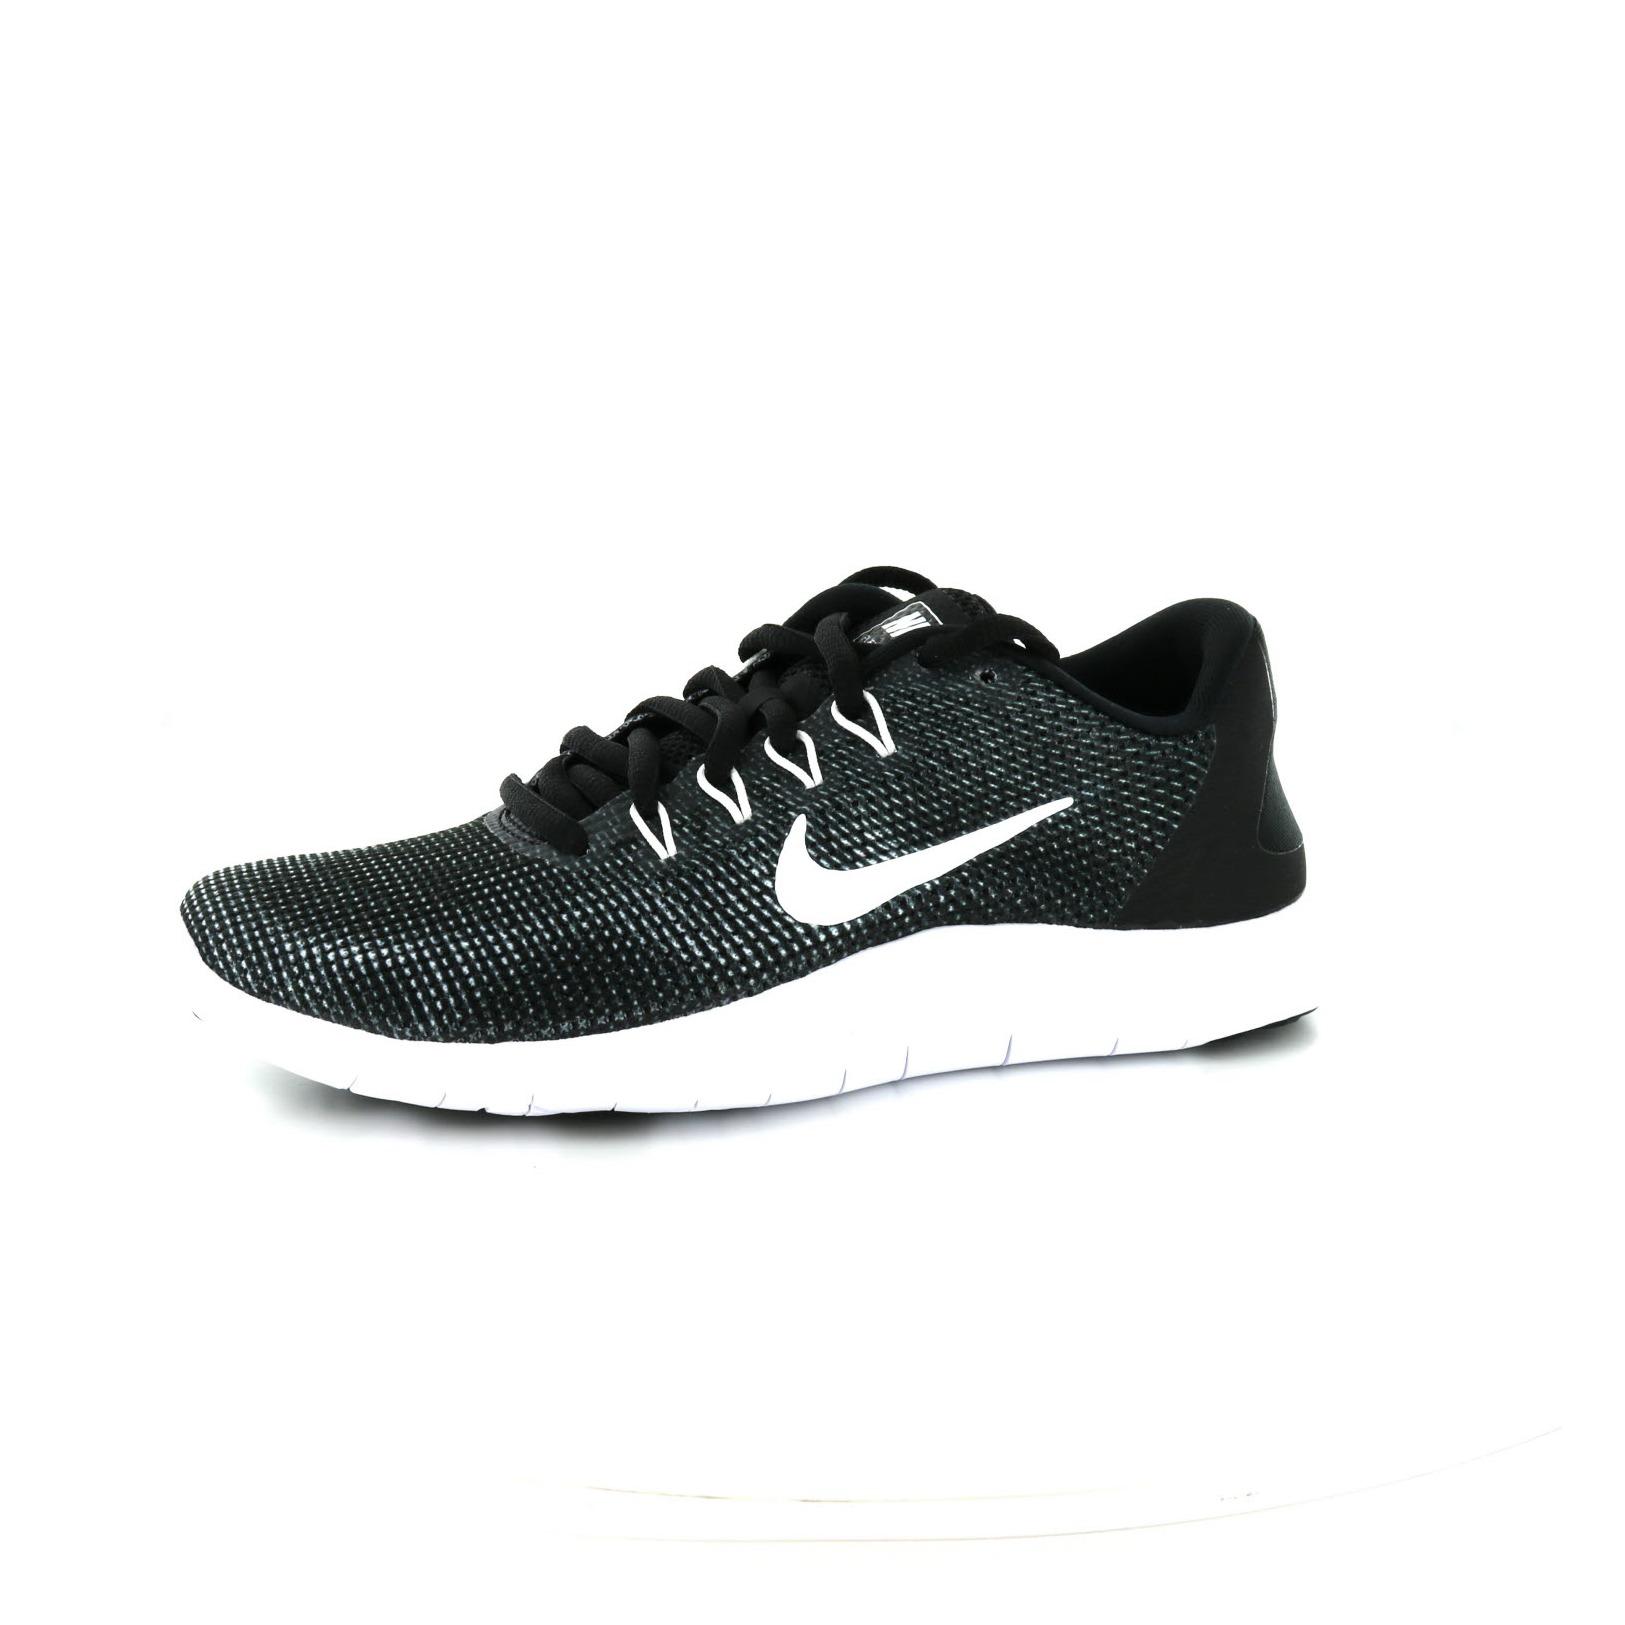 Nike / Pizzo Scarpe - Scarpe Da Ginnastica, Nero